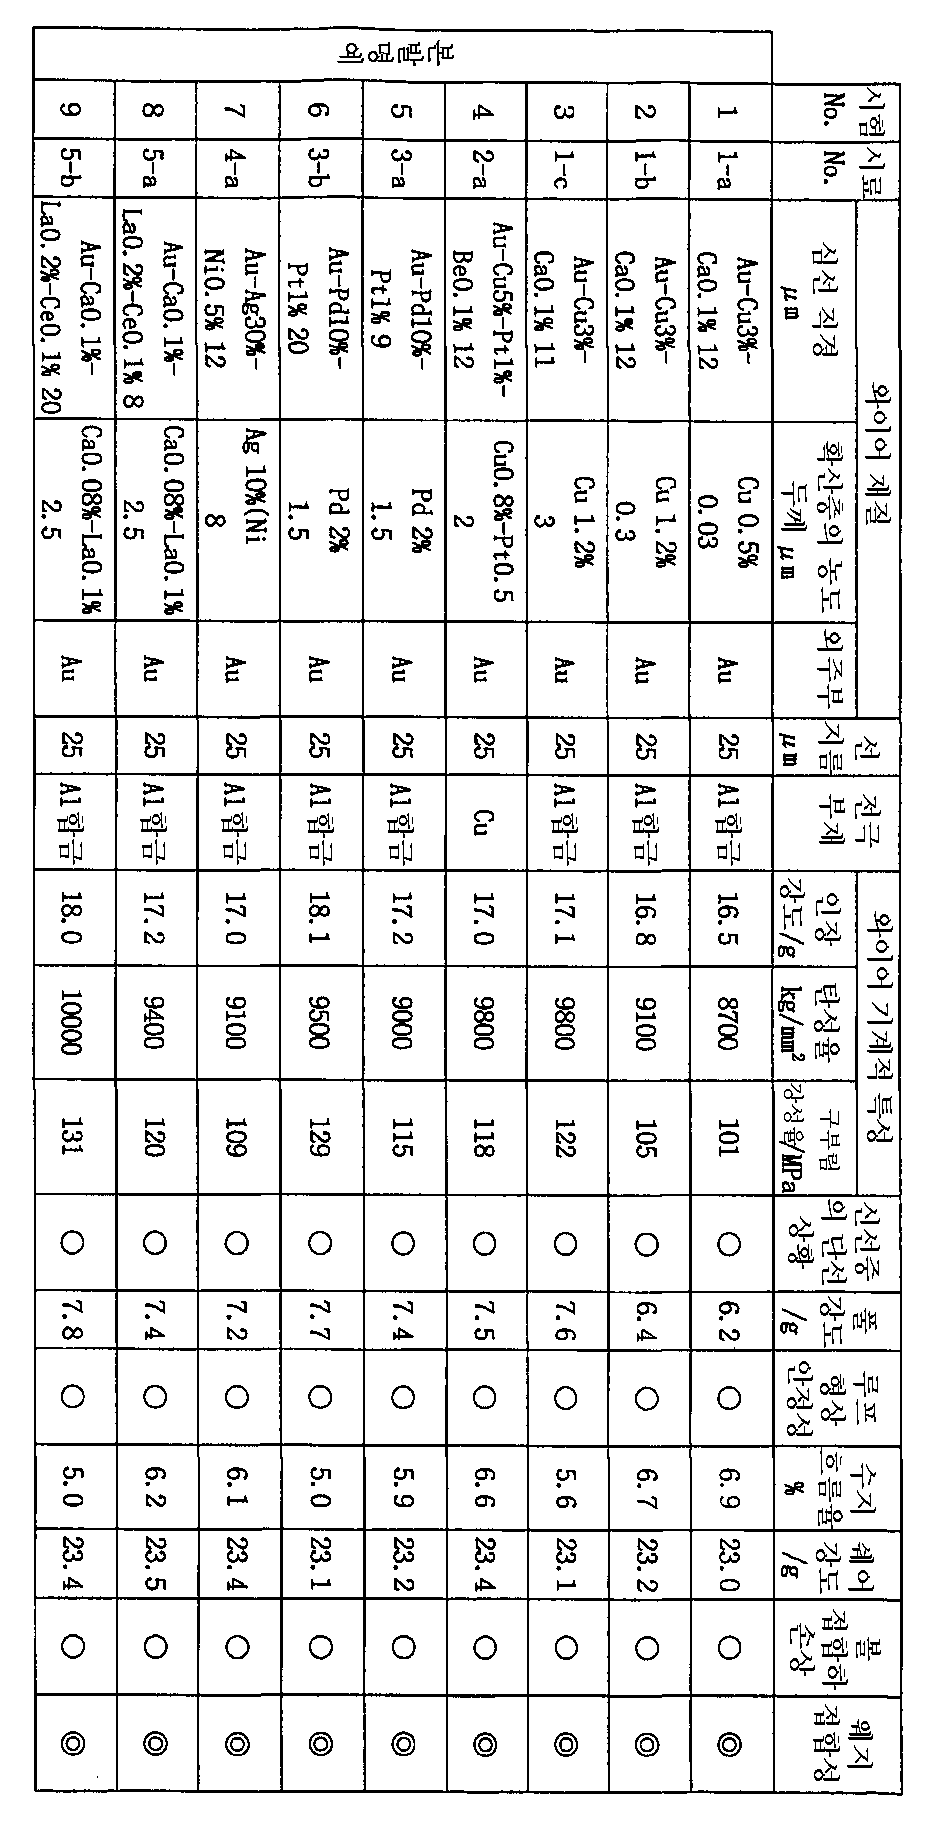 Figure 112003009118208-pct00001